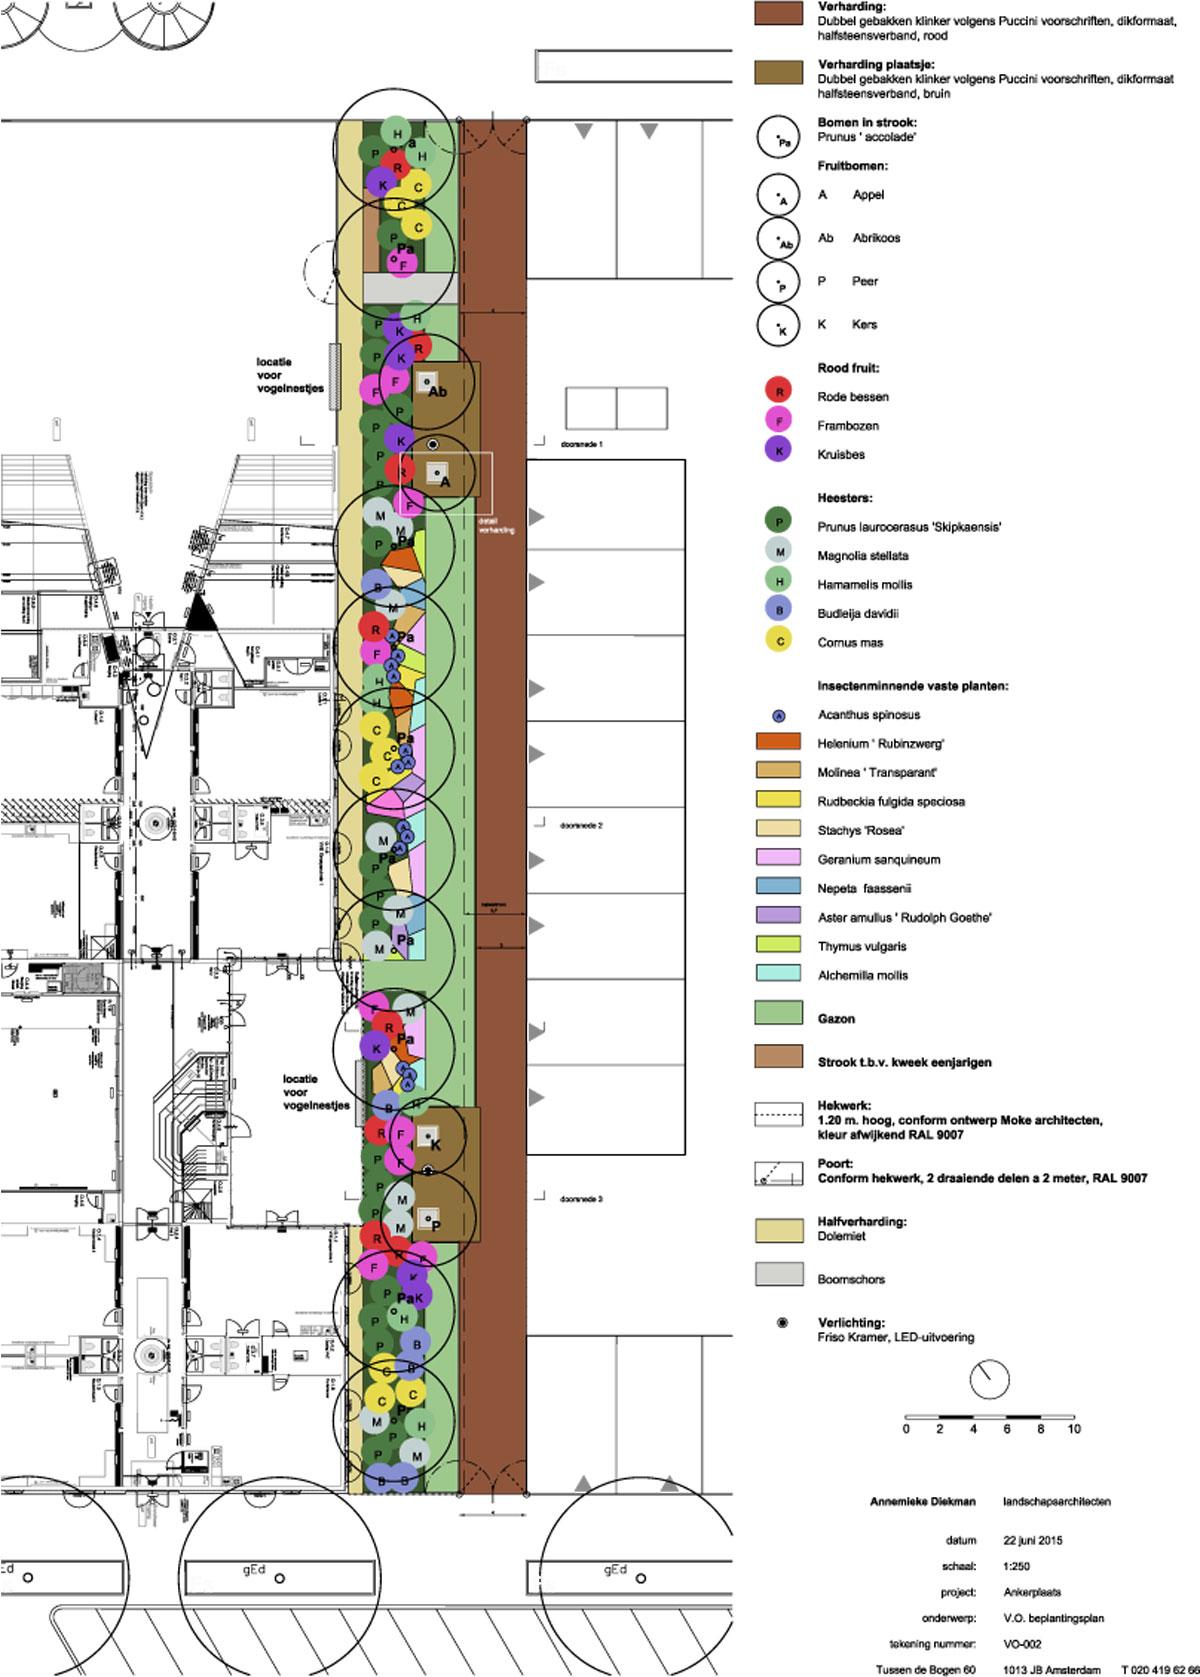 Ankerplaats_22juni2015-A3-1-250-beplantingsplan-1